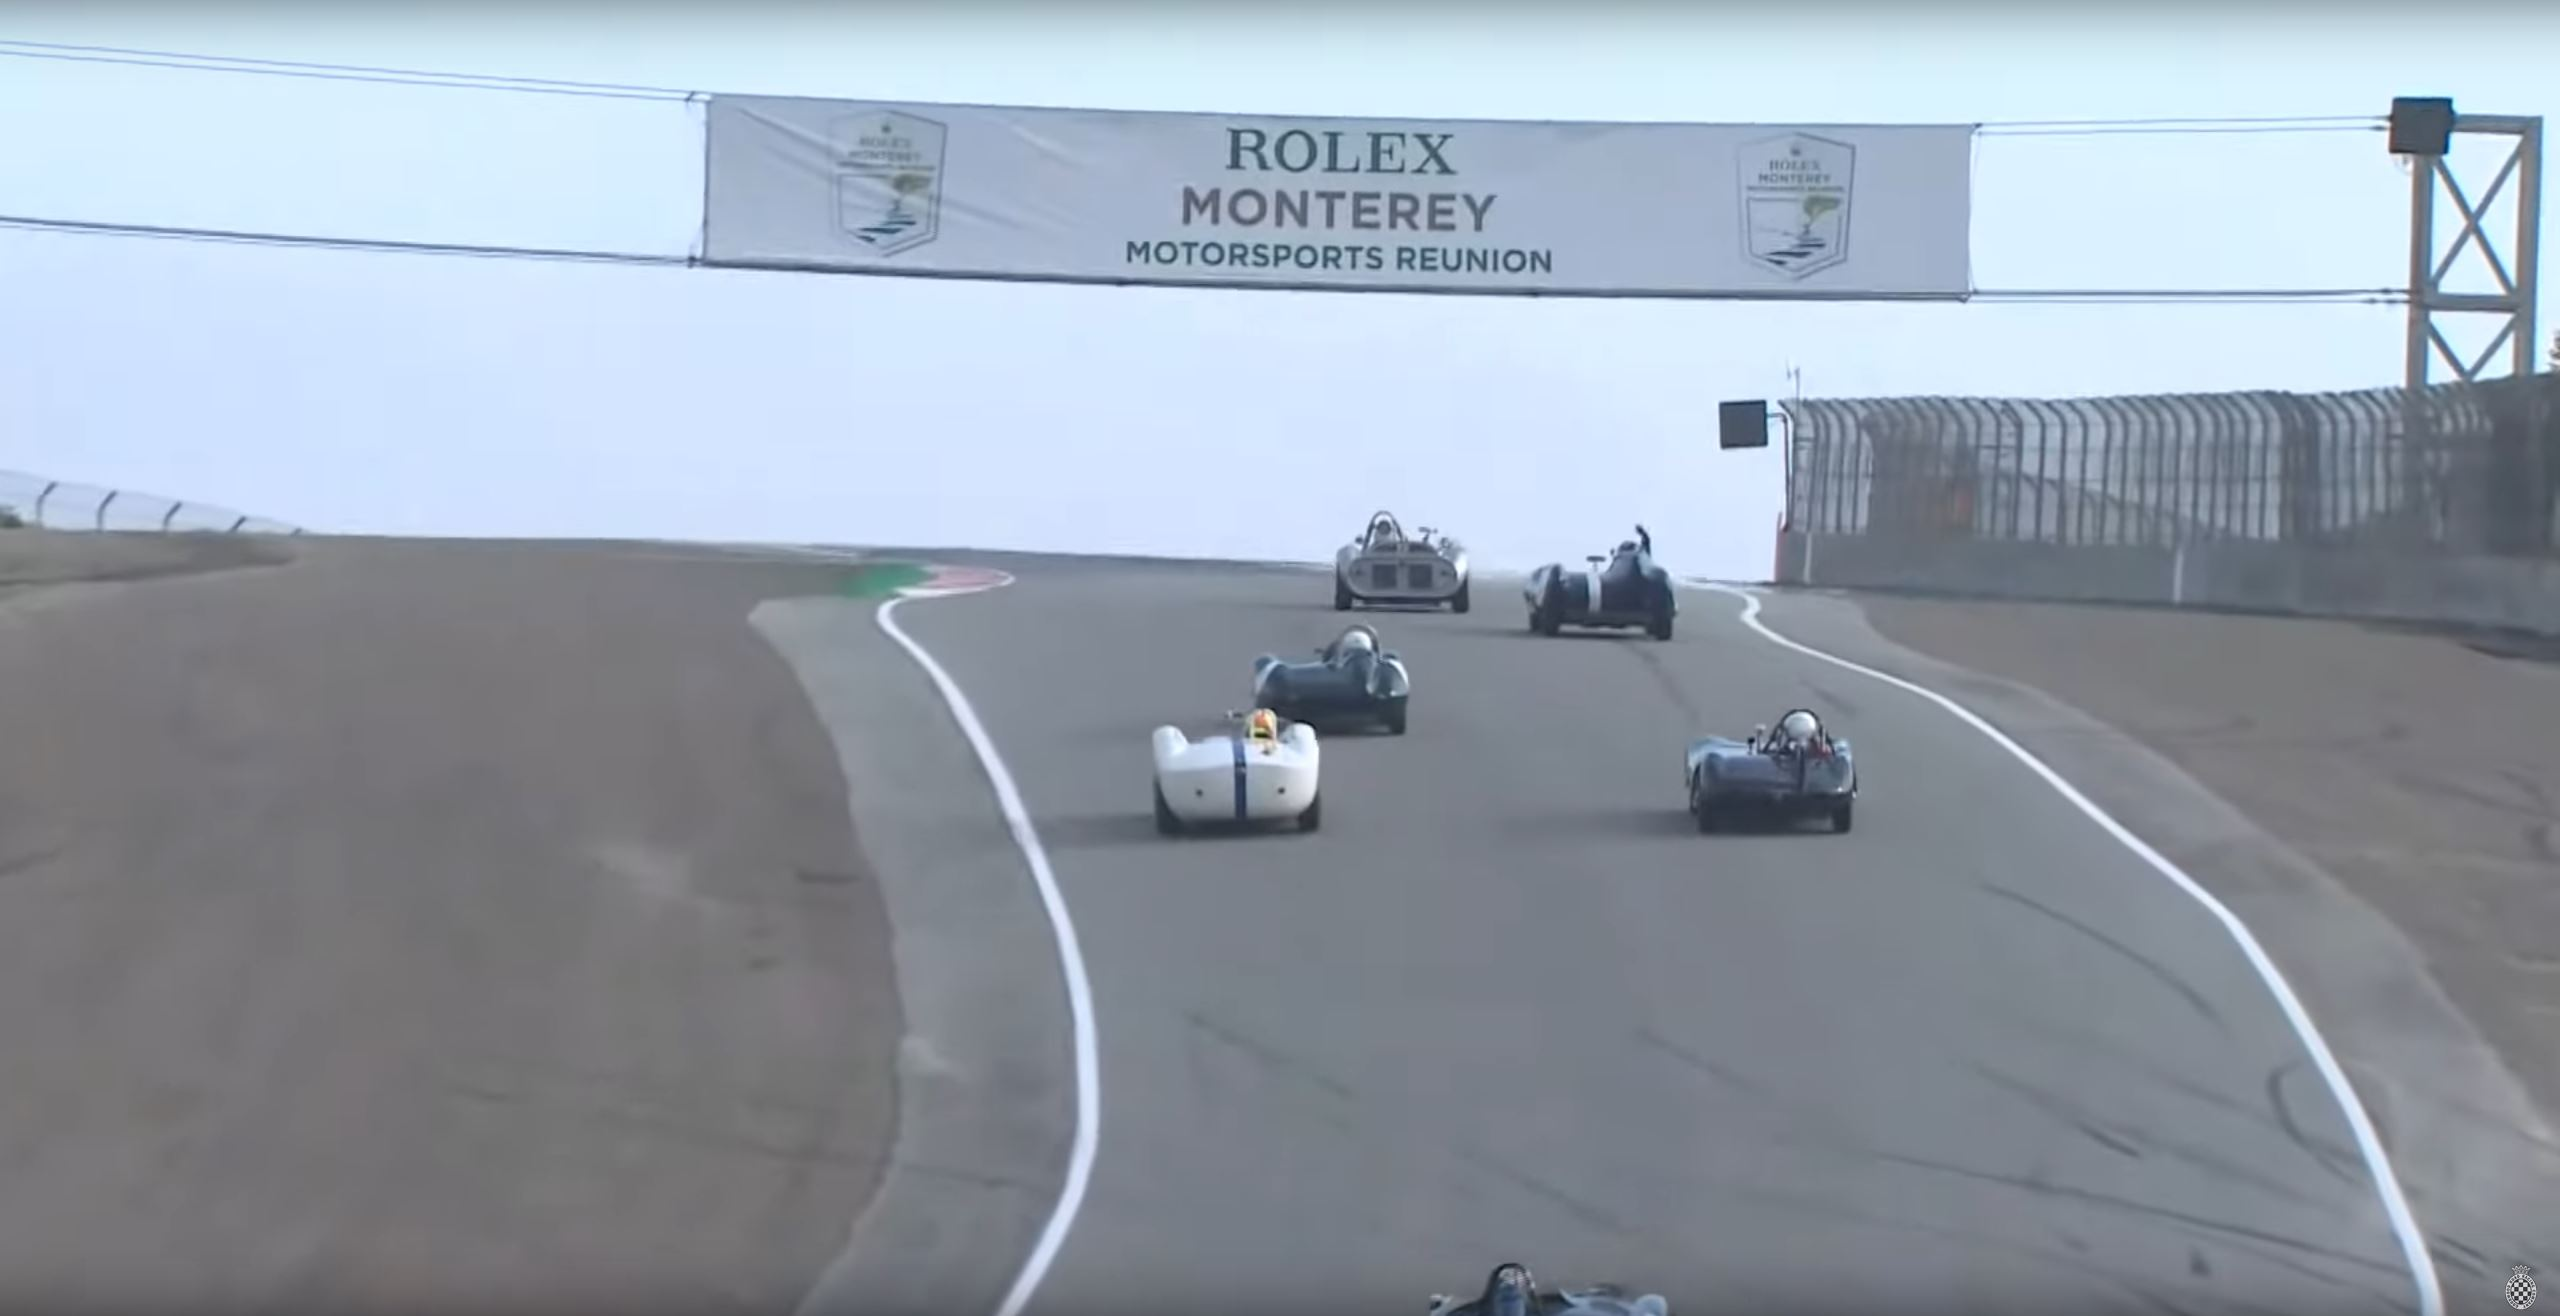 Monterey Motorsports Reunion Day 1 Highlights